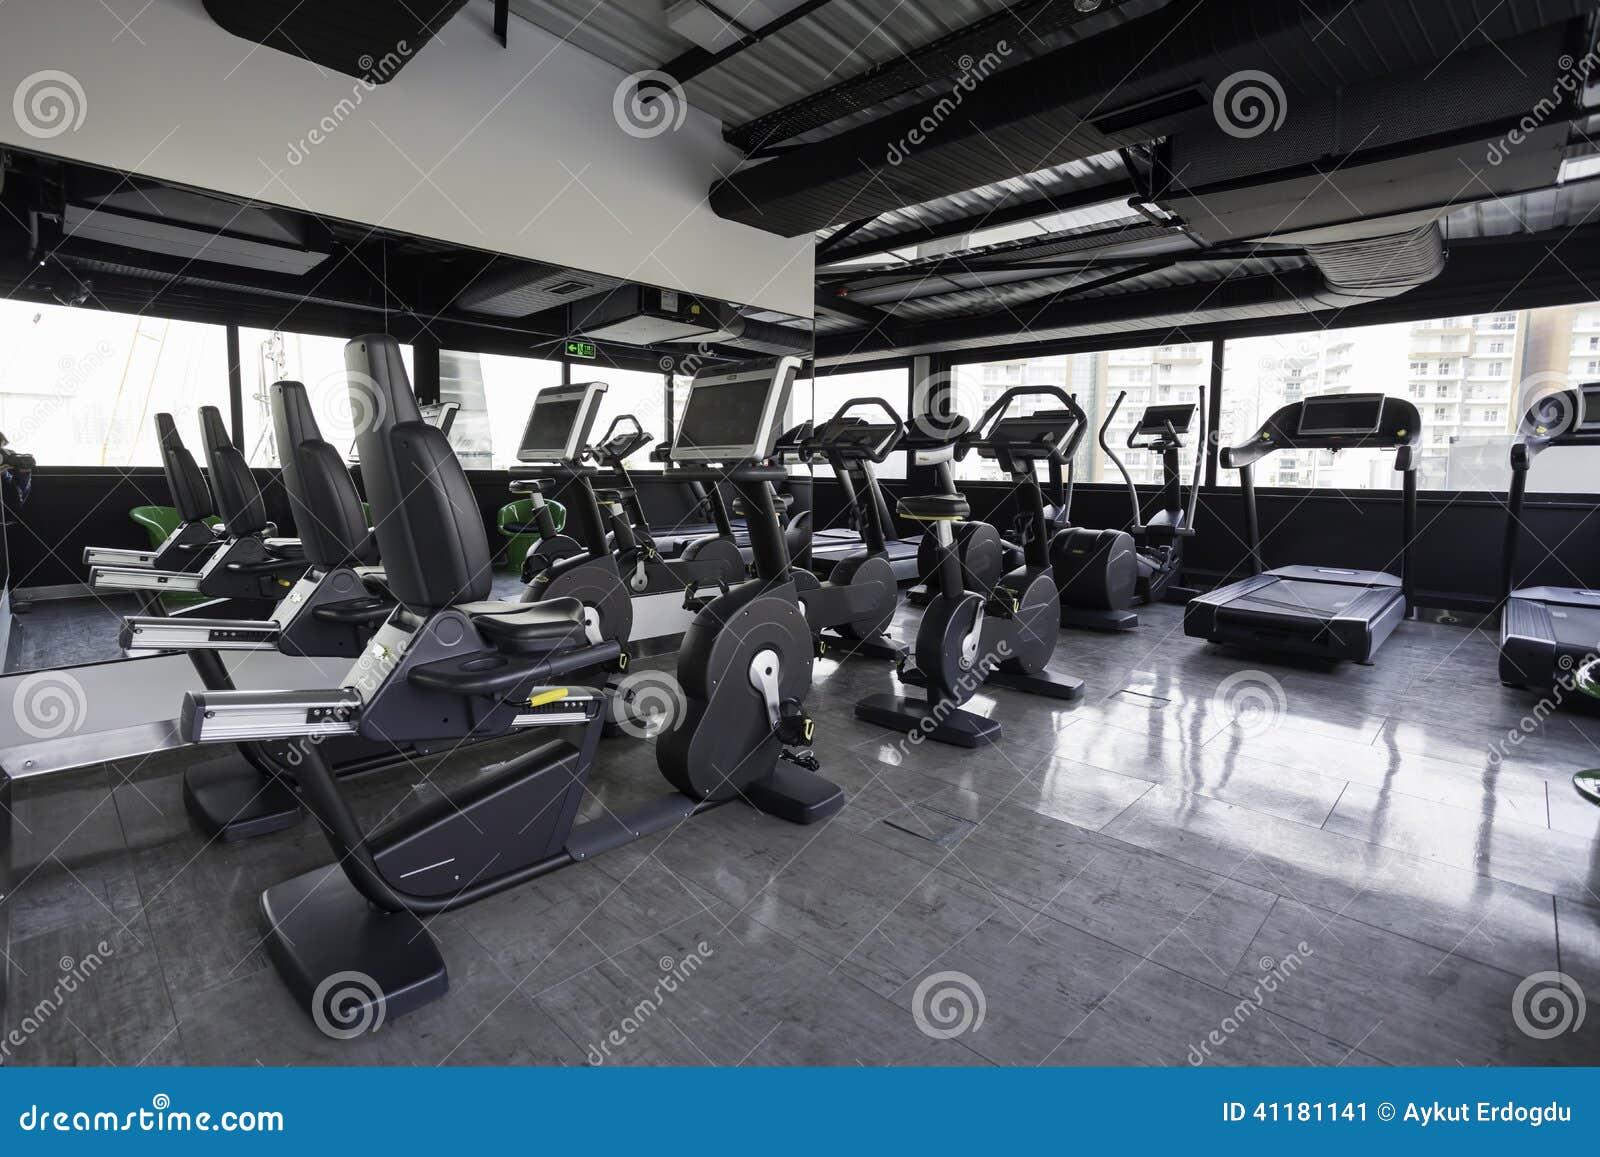 Fitness machines stock photo 73981446 for Gimnasio fitness club